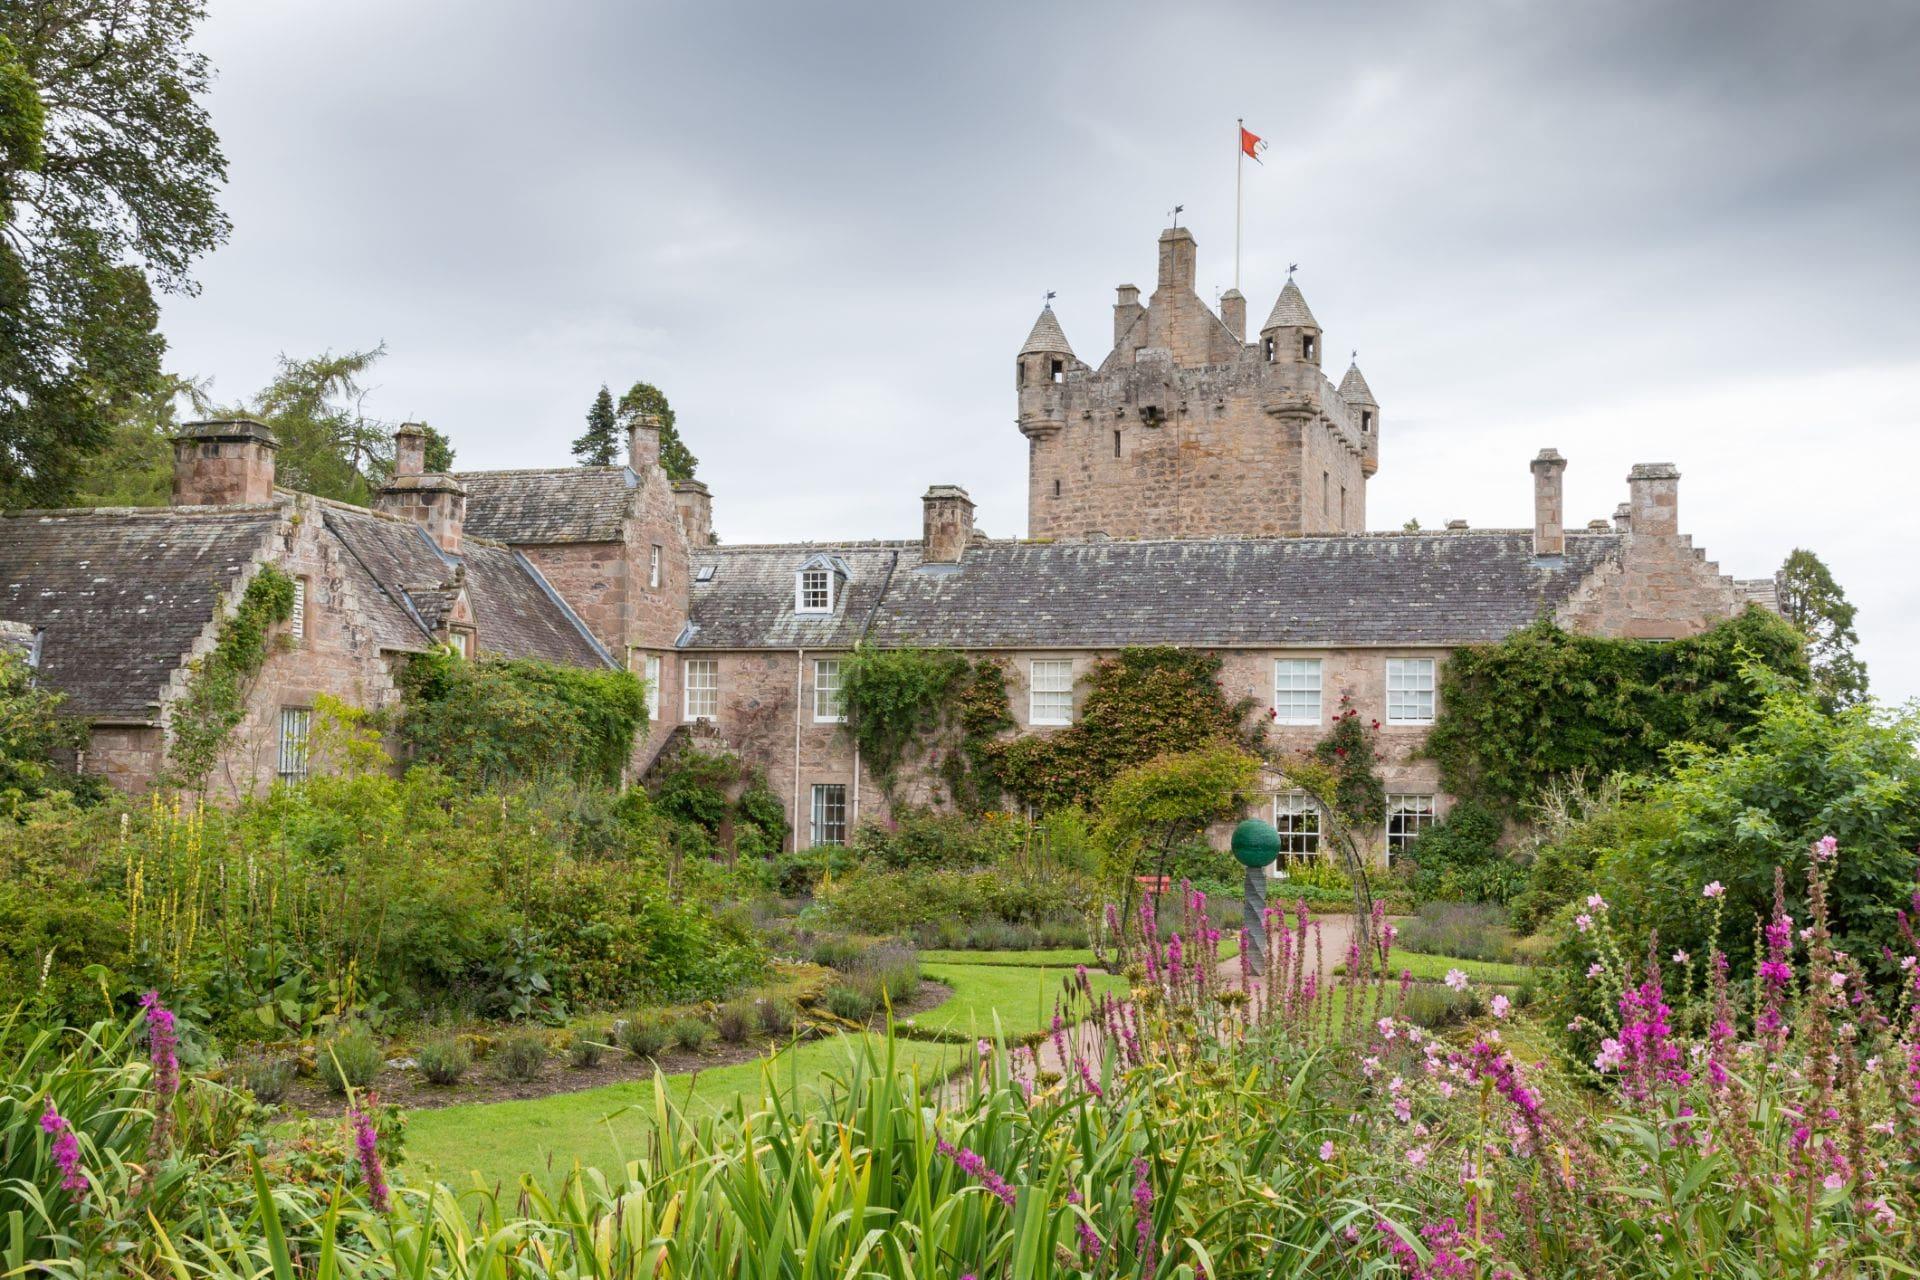 garden-full-of-pink-flowers-behind-cawdor-castle